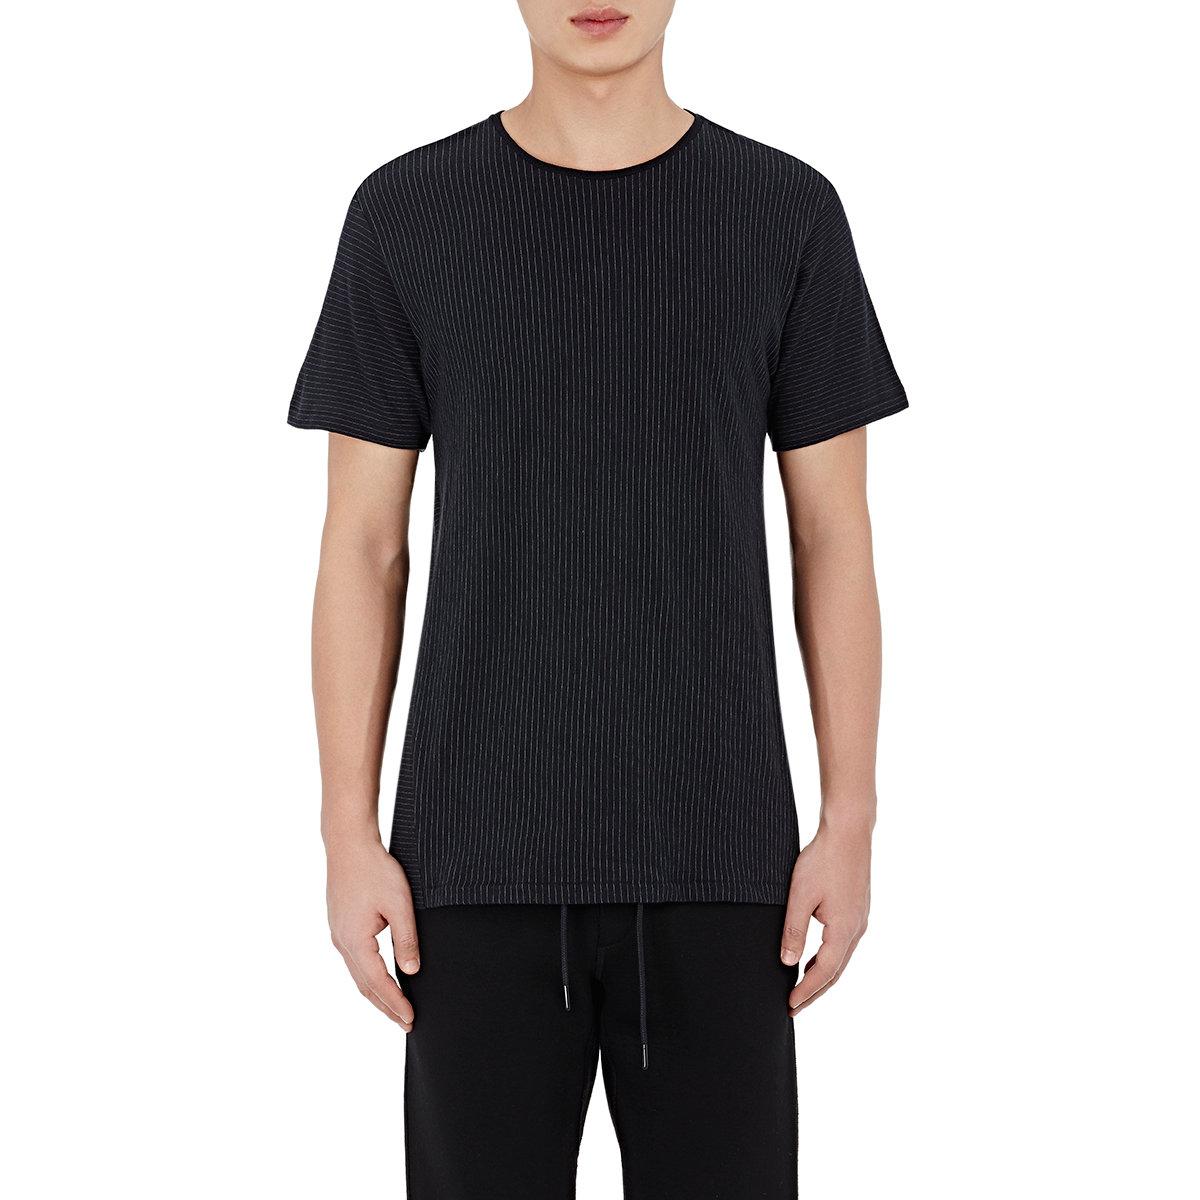 Rag bone men 39 s pinstriped jersey t shirt in blue for men for Rag bone shirt